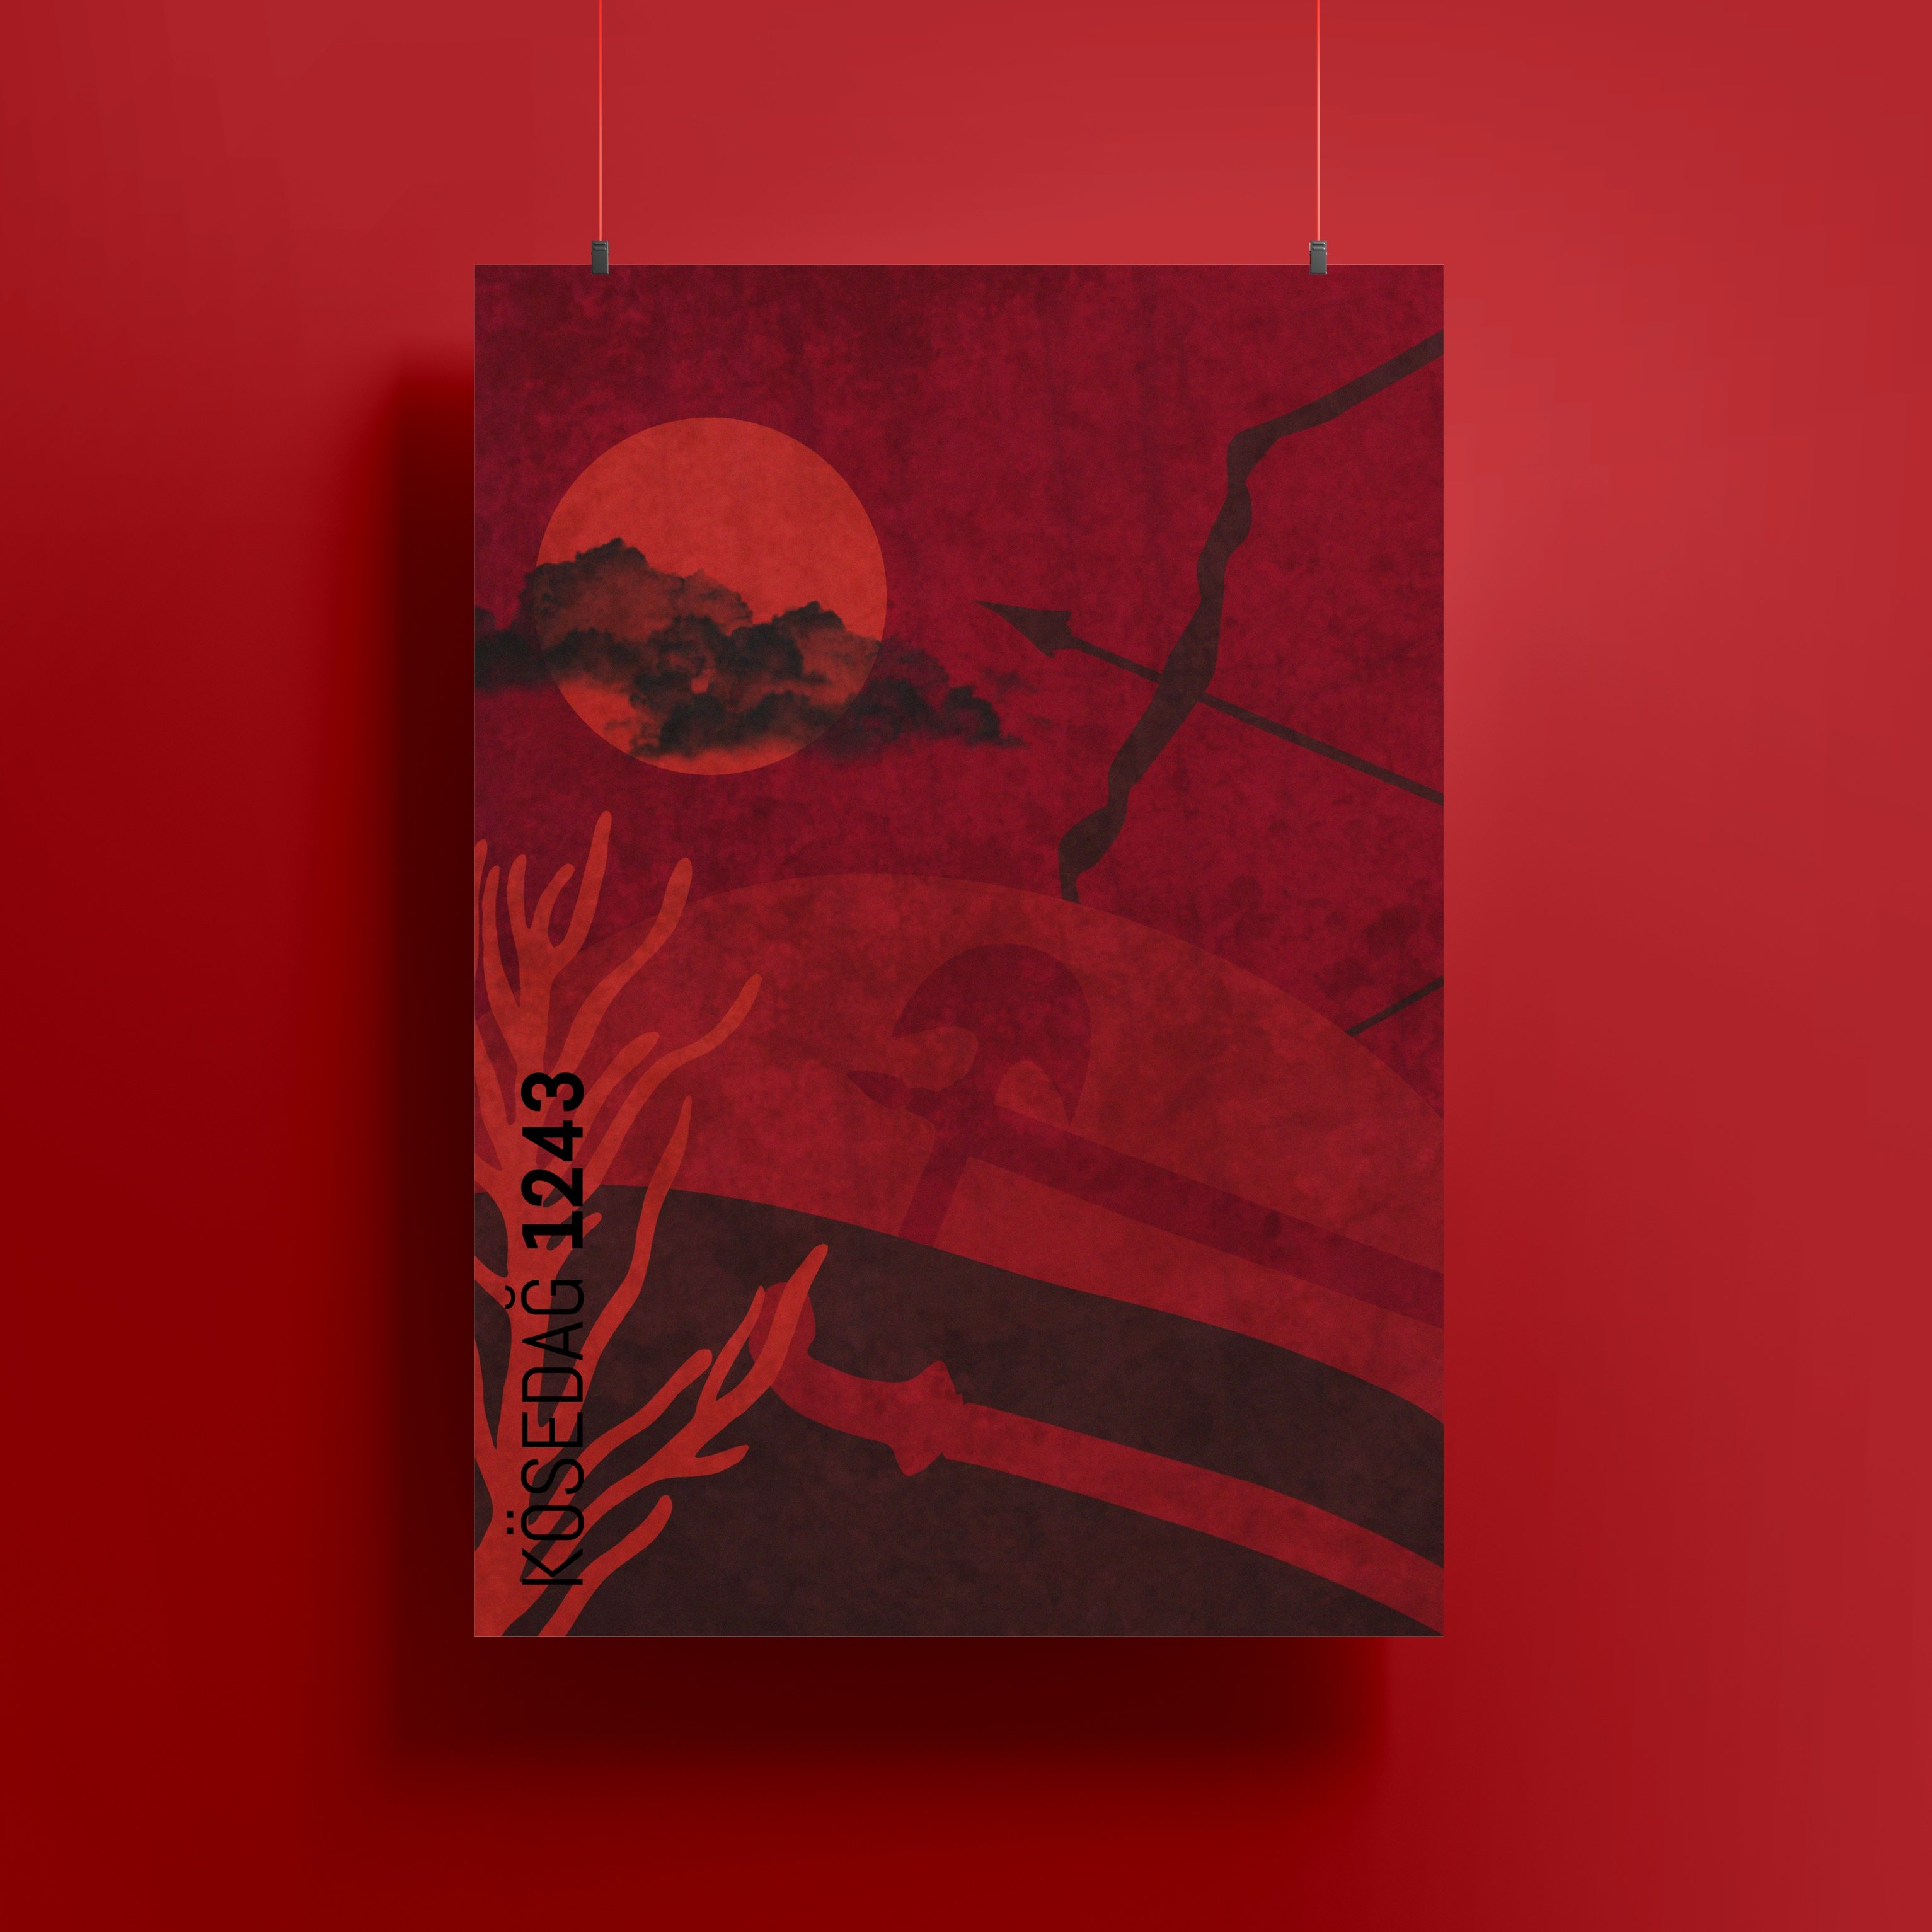 Kösedağ Muharebesi Minimal Poster